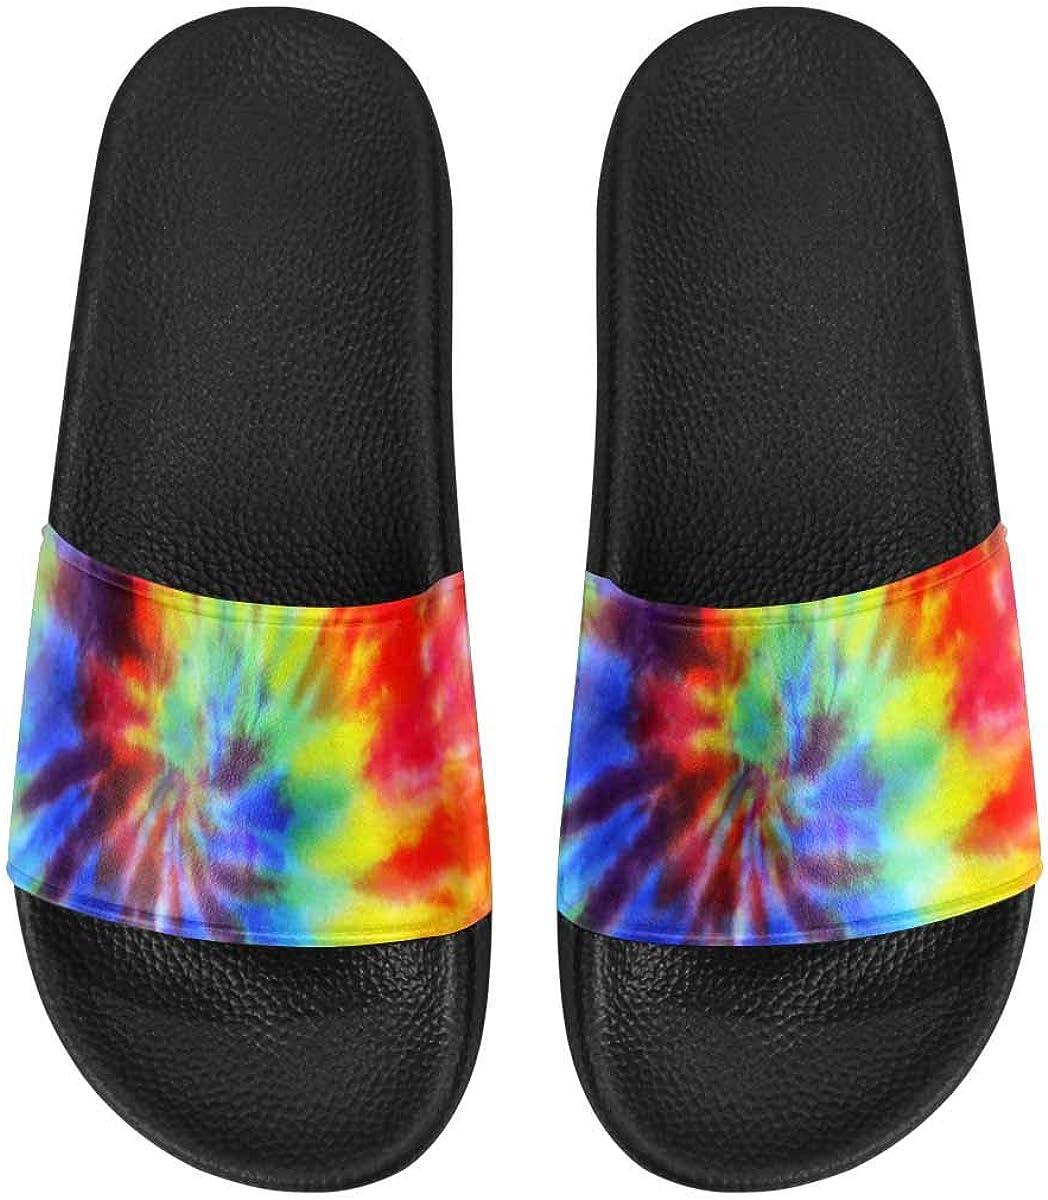 InterestPrint Women's Open Toe Slide Sandals (US6-US12)